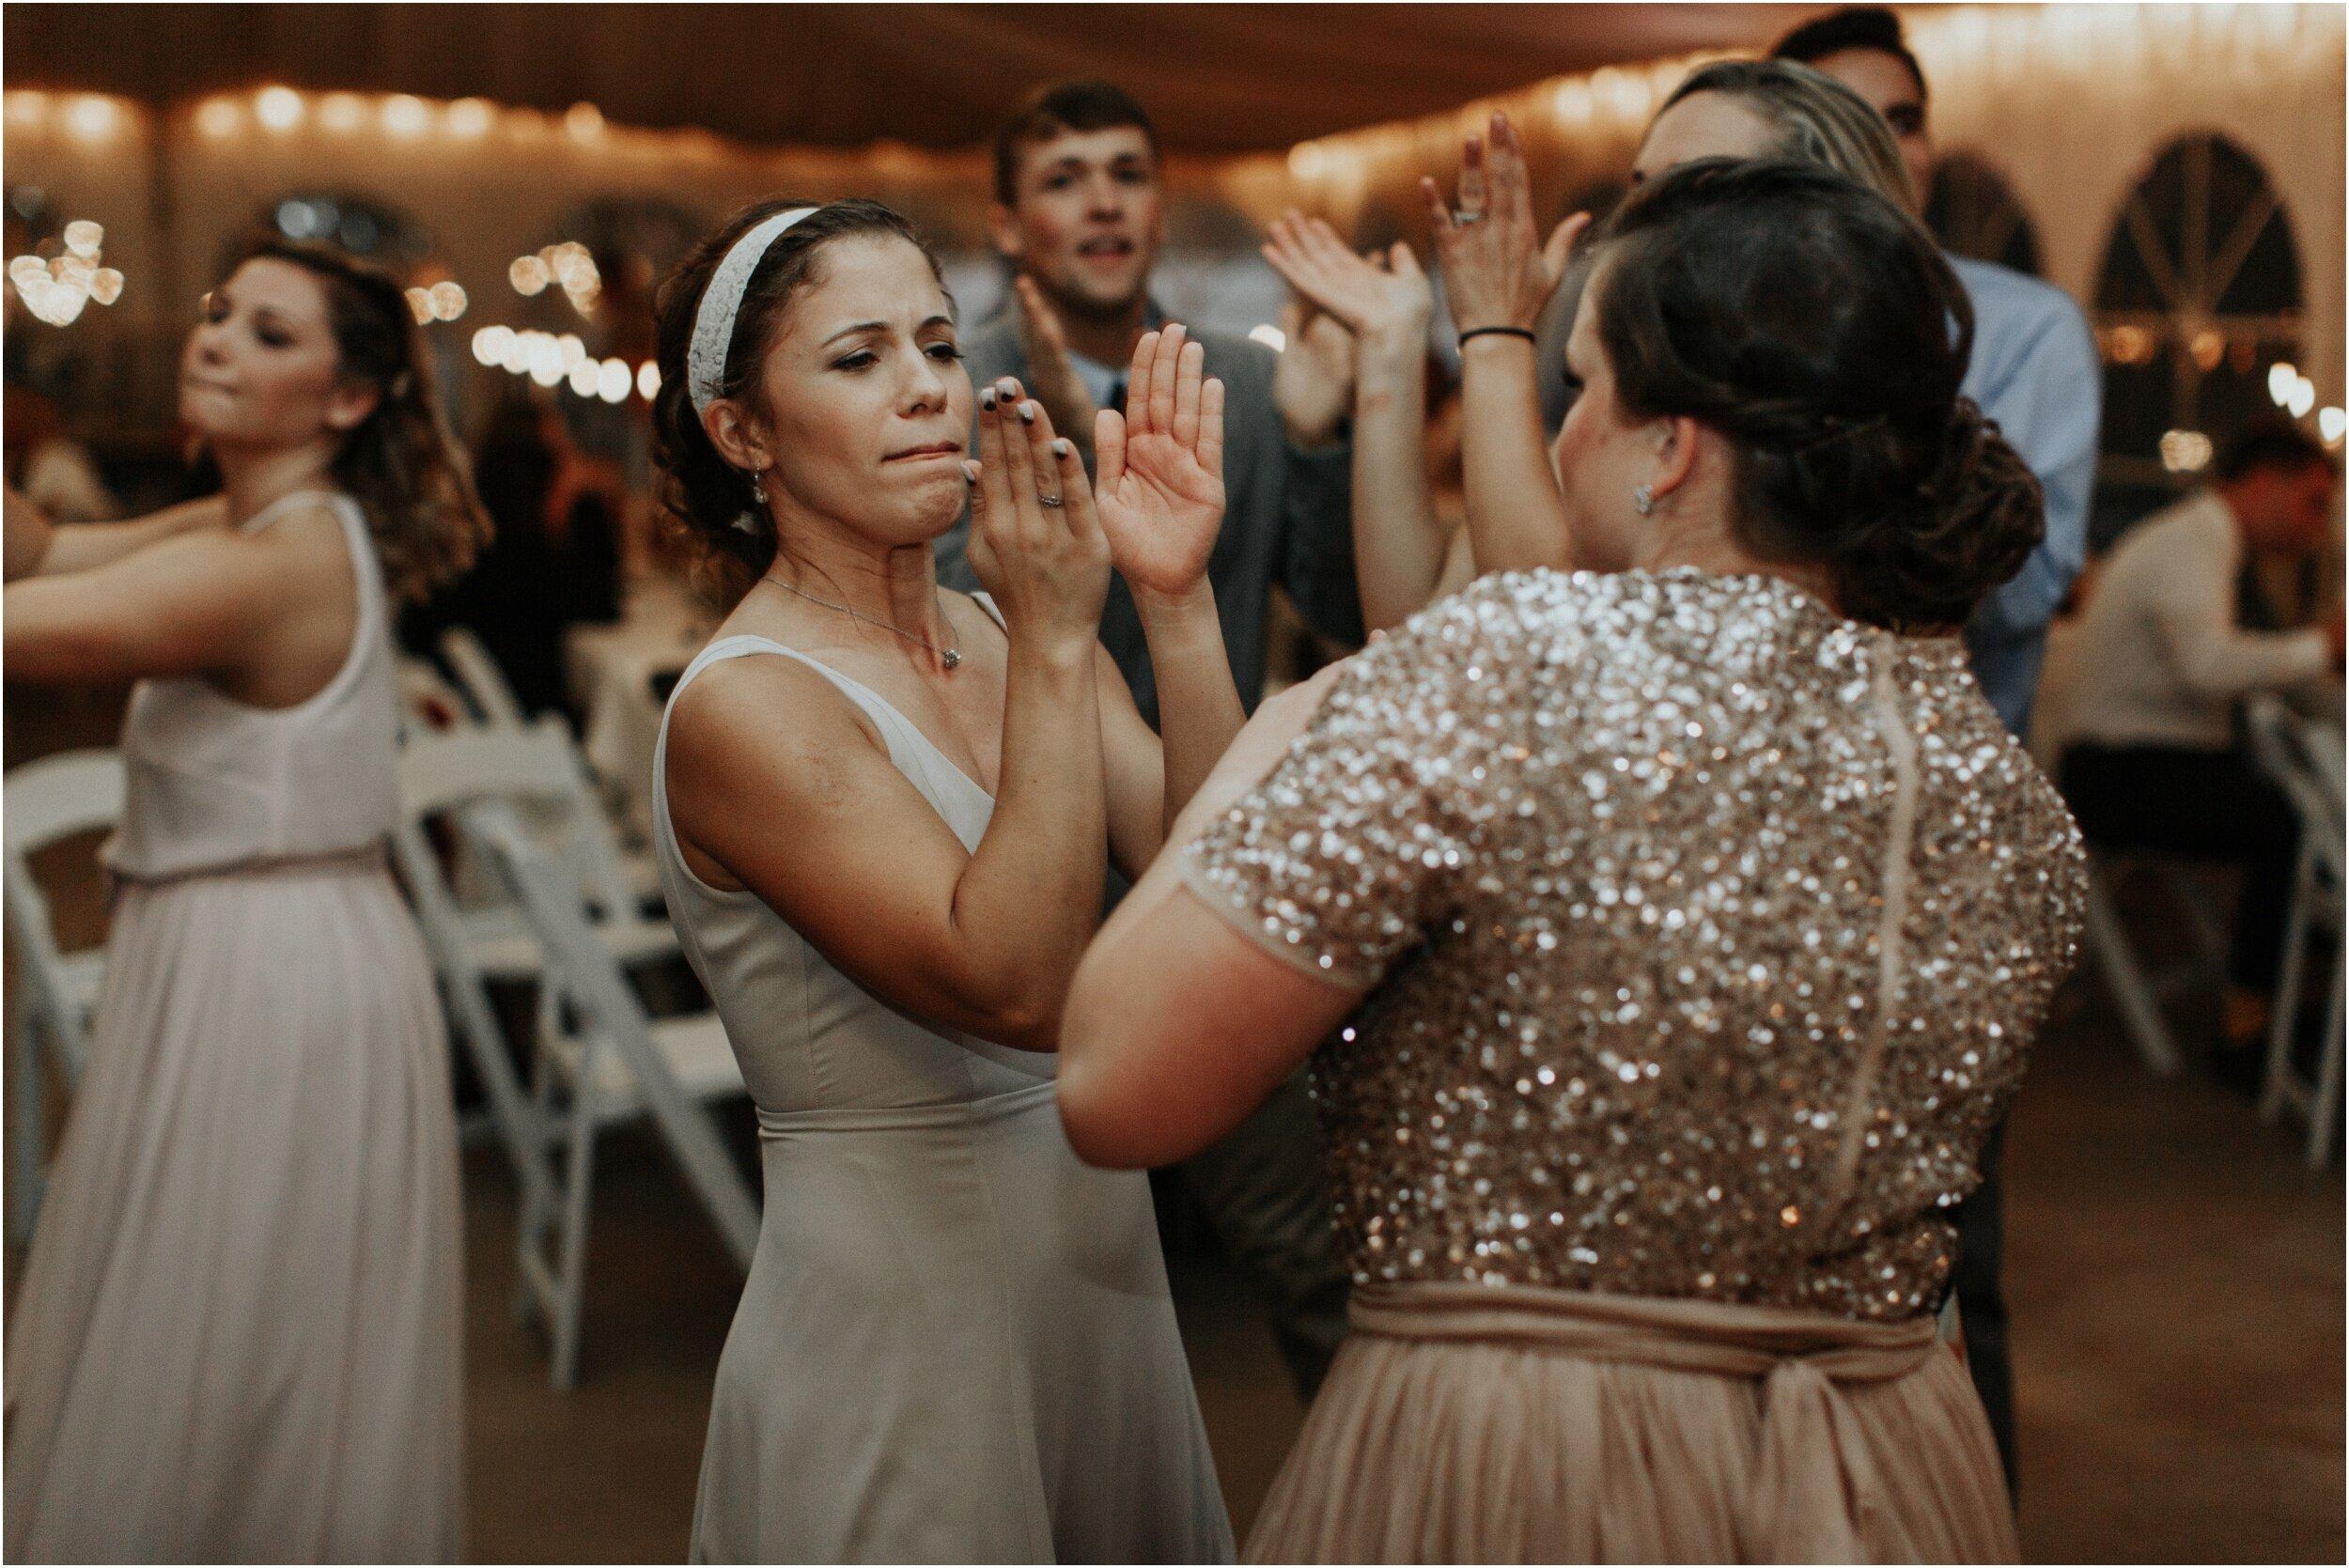 steph-and-jordan-cox-our-wedding-historic-shady-lane-compass-wedding-collective-hazel-lining-photography-destination-elopement-wedding-engagement-photography_0090.jpg